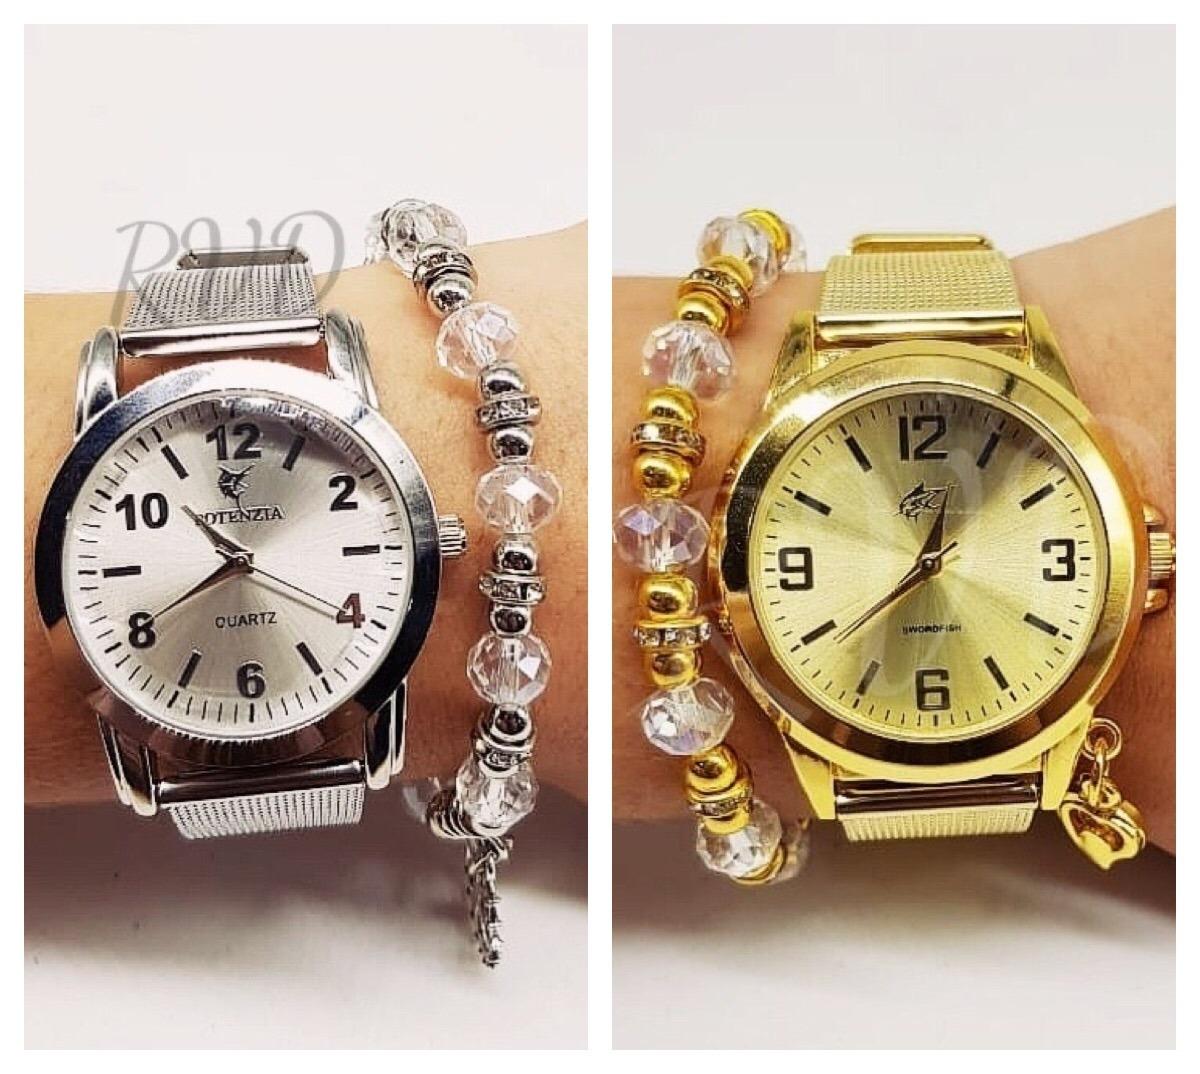 6fe1a2b0ac5 Kit C  02 Relógios Feminino Esporte Fino + Pulseiras + Caixa - R  76 ...